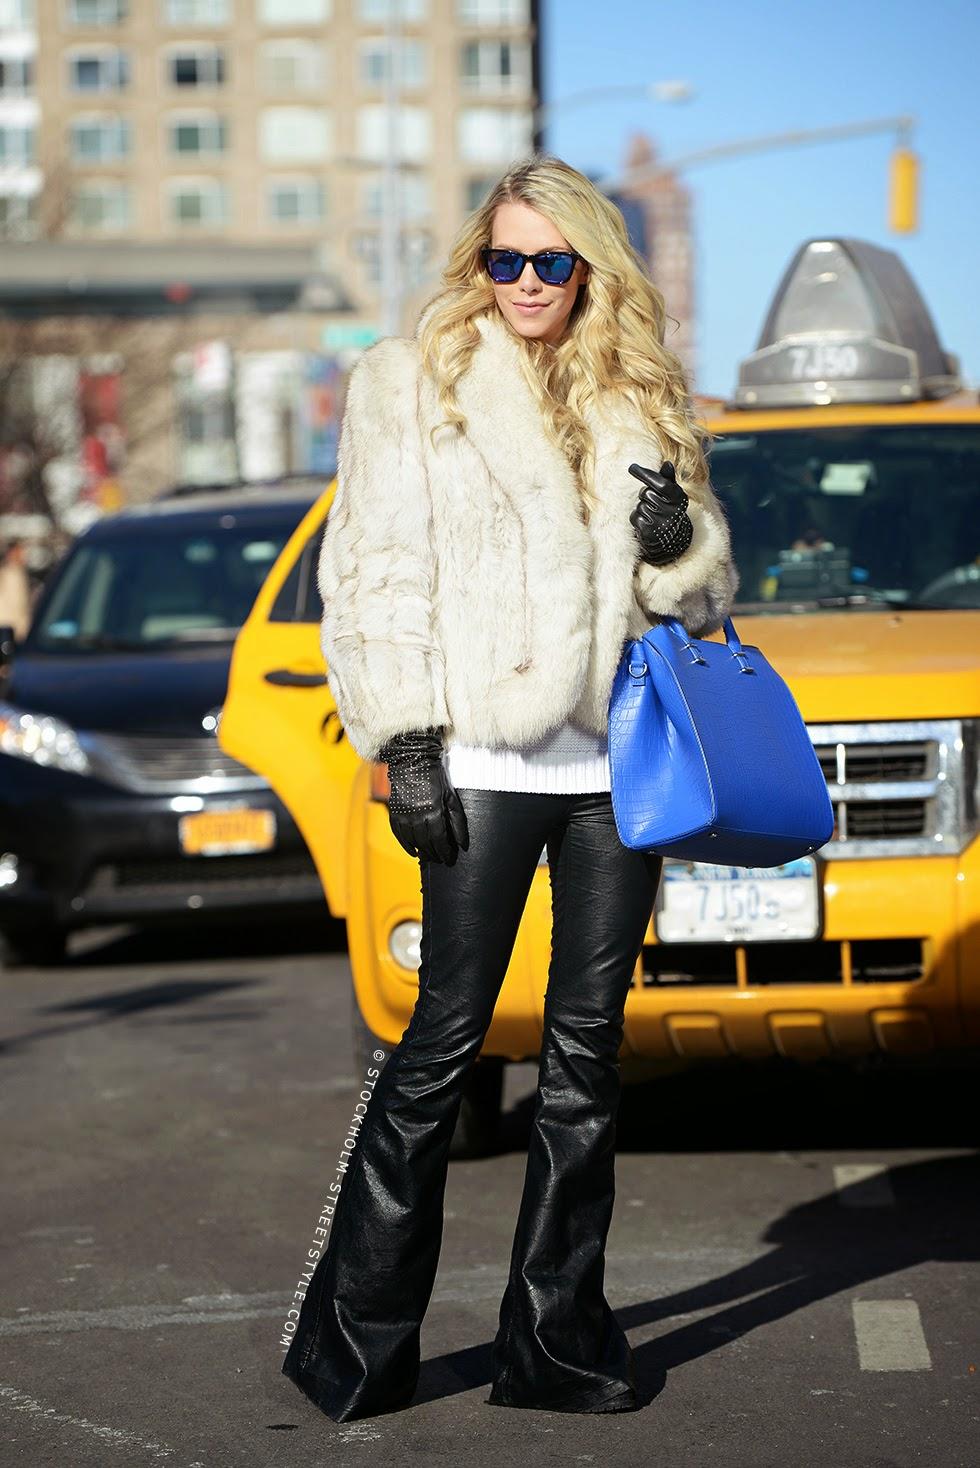 Pantalones campana cuero street style 2015